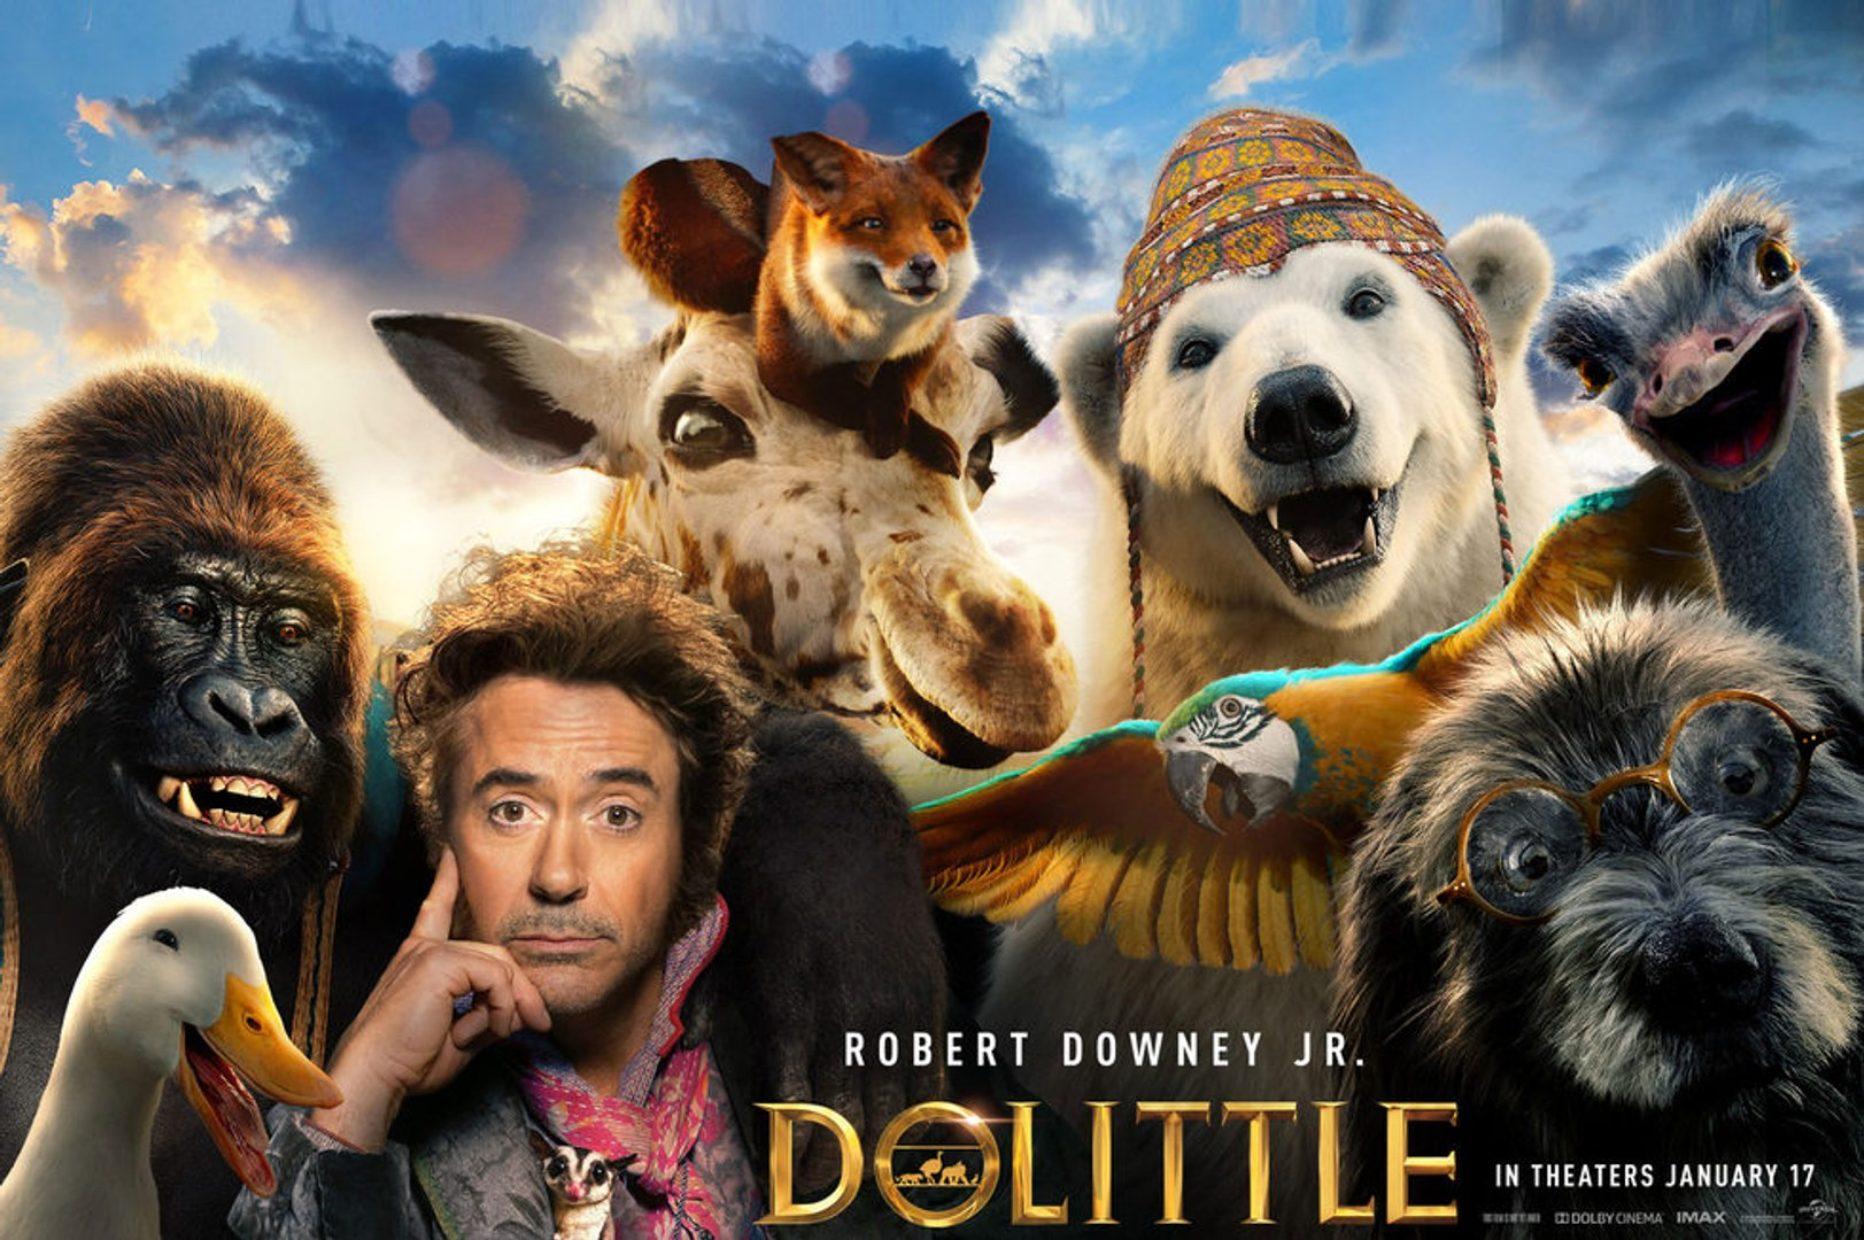 DOLITTLE con Robert Downey Jr.